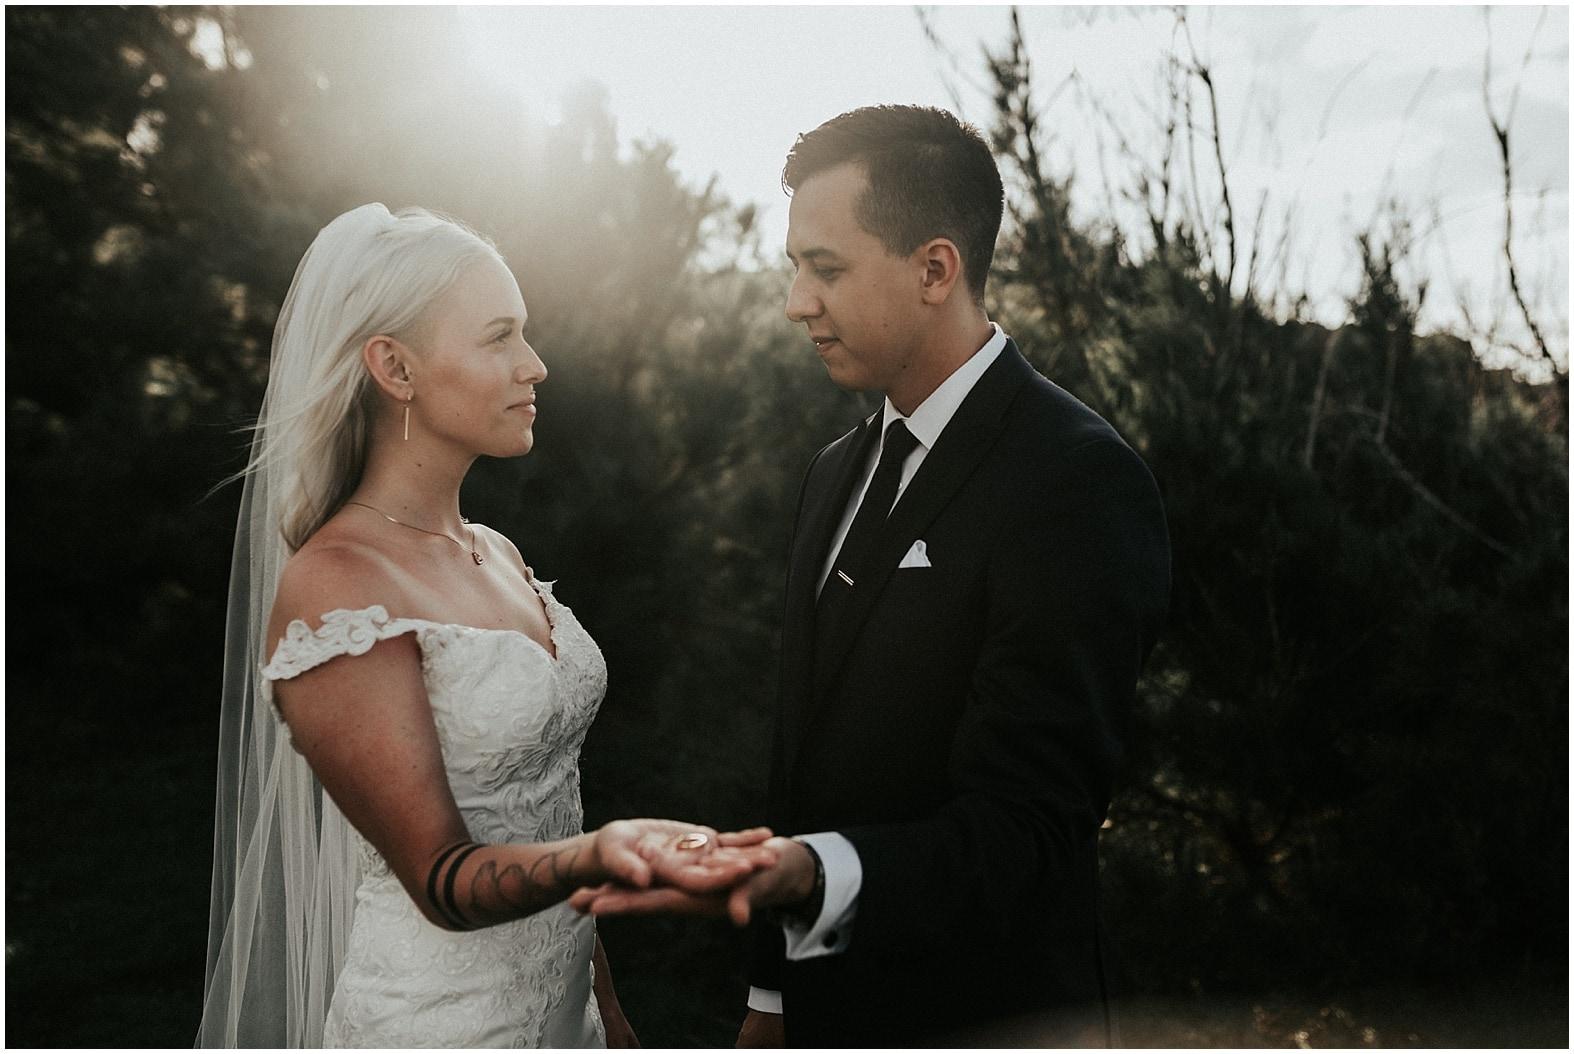 Jordan and Marco ~ Adventure elopement in Maui, Hawaii.